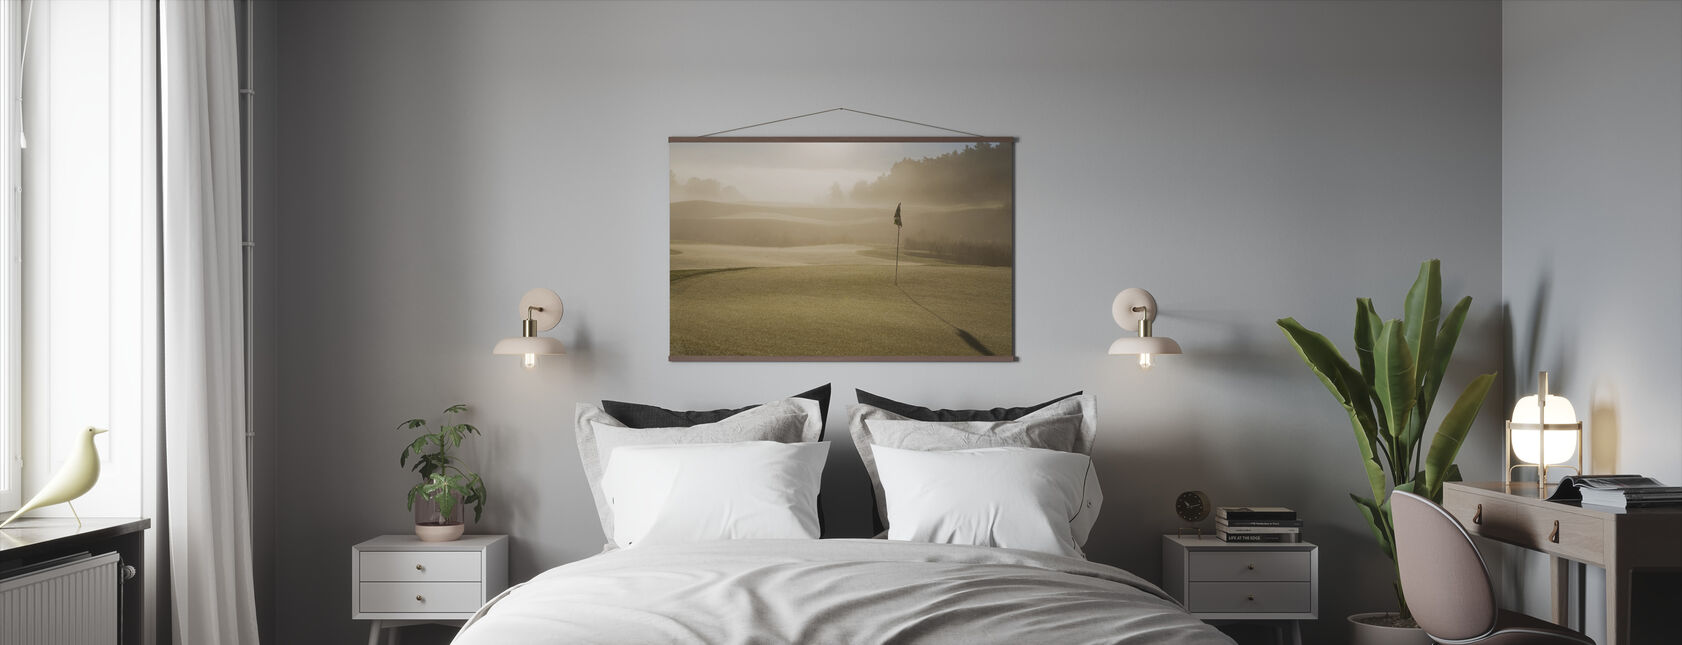 Golf Court in Mölndal, Sweden - Poster - Slaapkamer